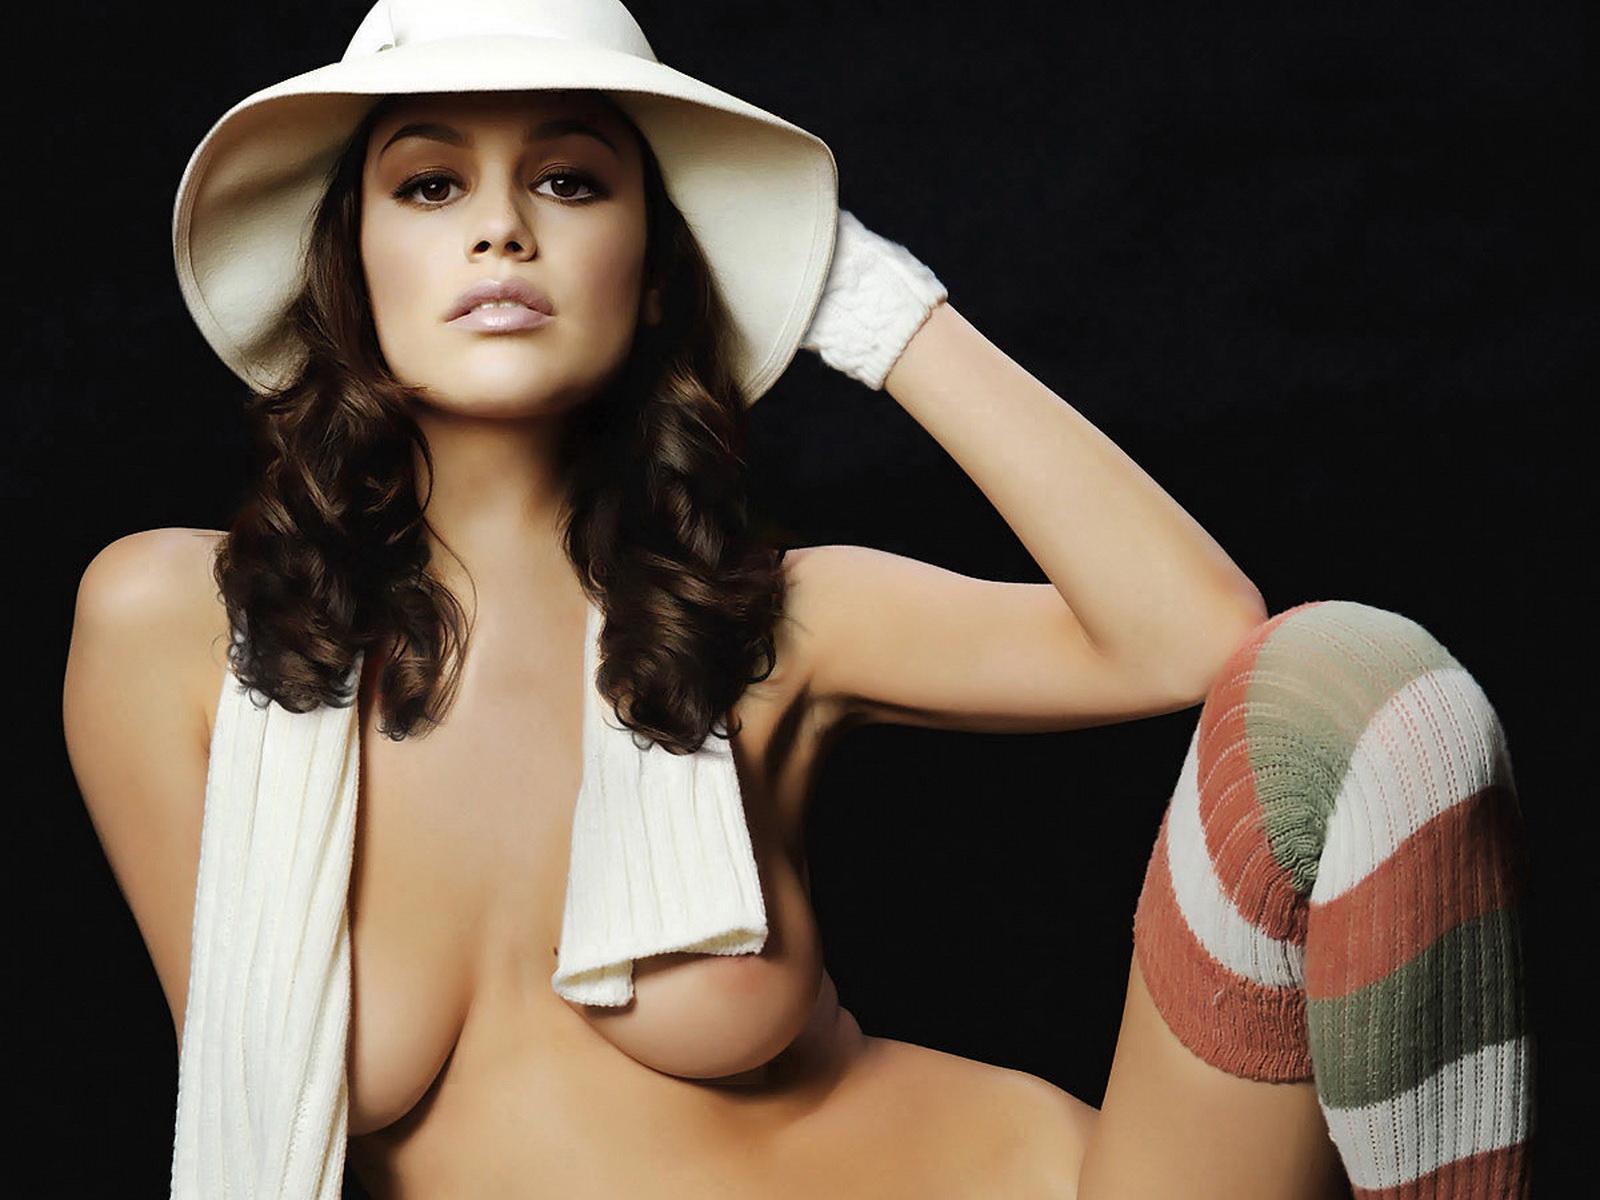 http://2.bp.blogspot.com/-wgw6RW43b_M/Tsz-NMFAsJI/AAAAAAAAC1E/c8-235N-EOI/s1600/Rachel+Bilson+nude+in+Maxim+photo+shoot+big+boobs+trimmed+pussy+beauty+body.jpg